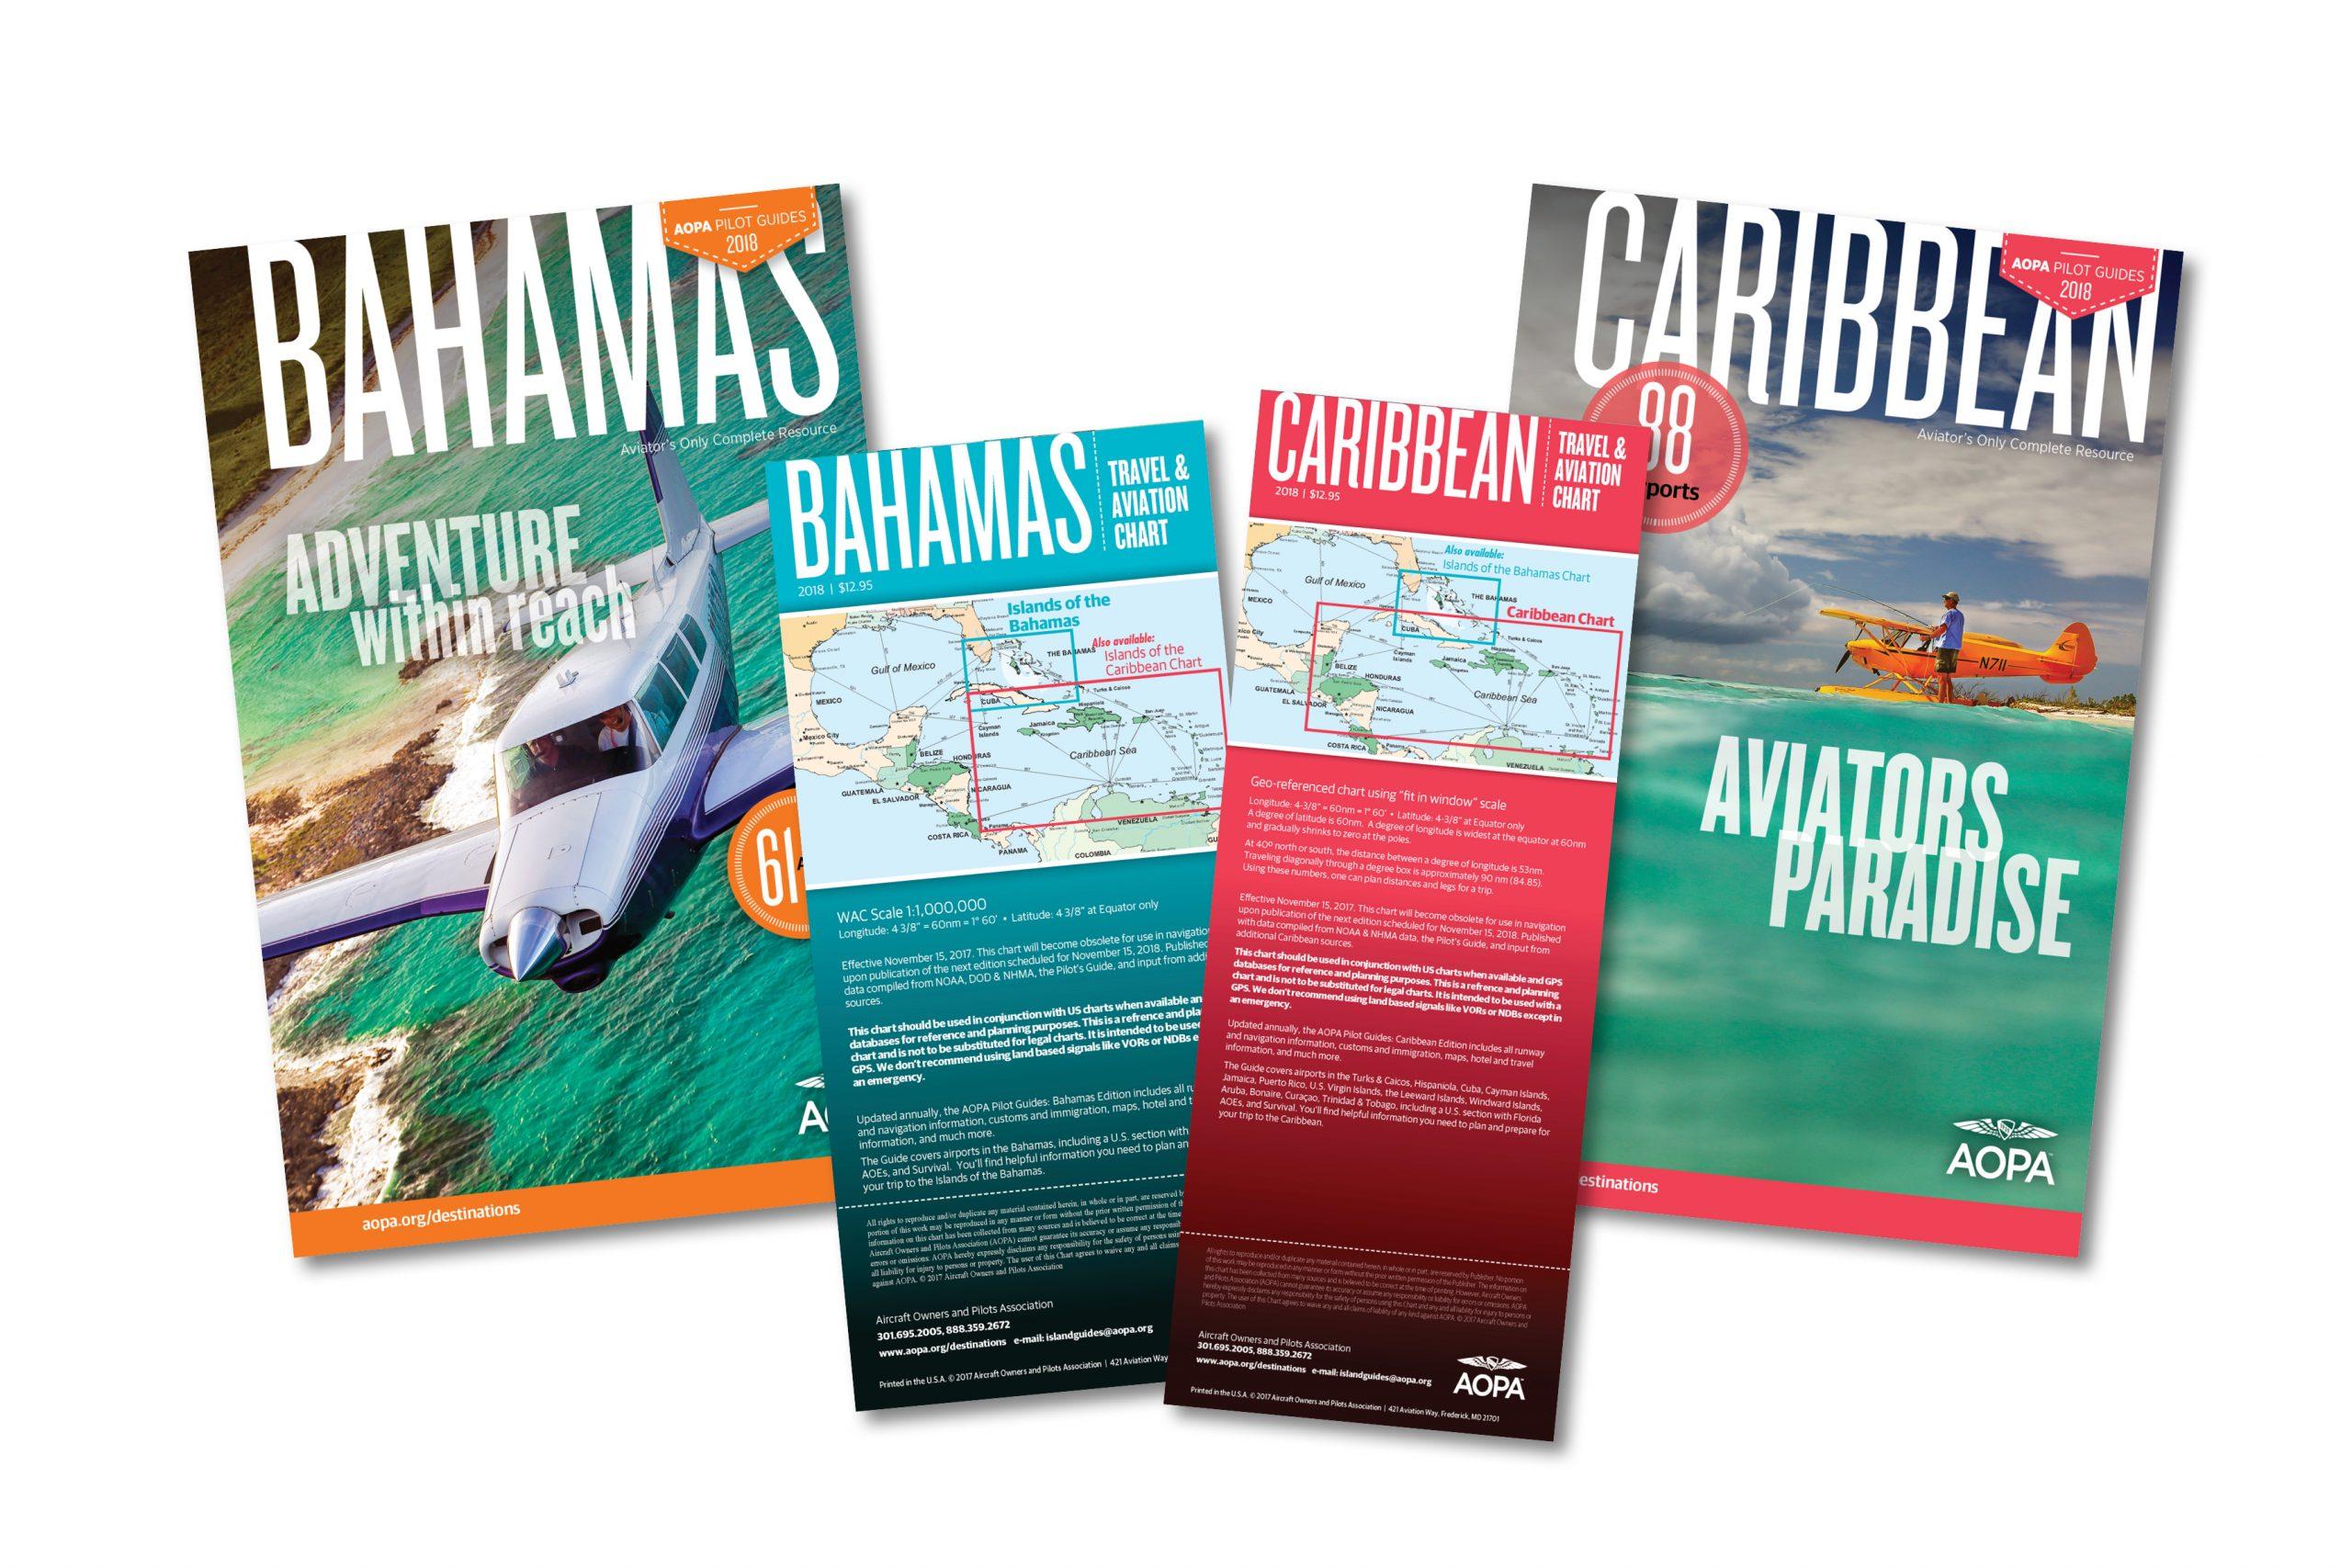 AOPA Pilot Guides: Bahamas and Caribbean